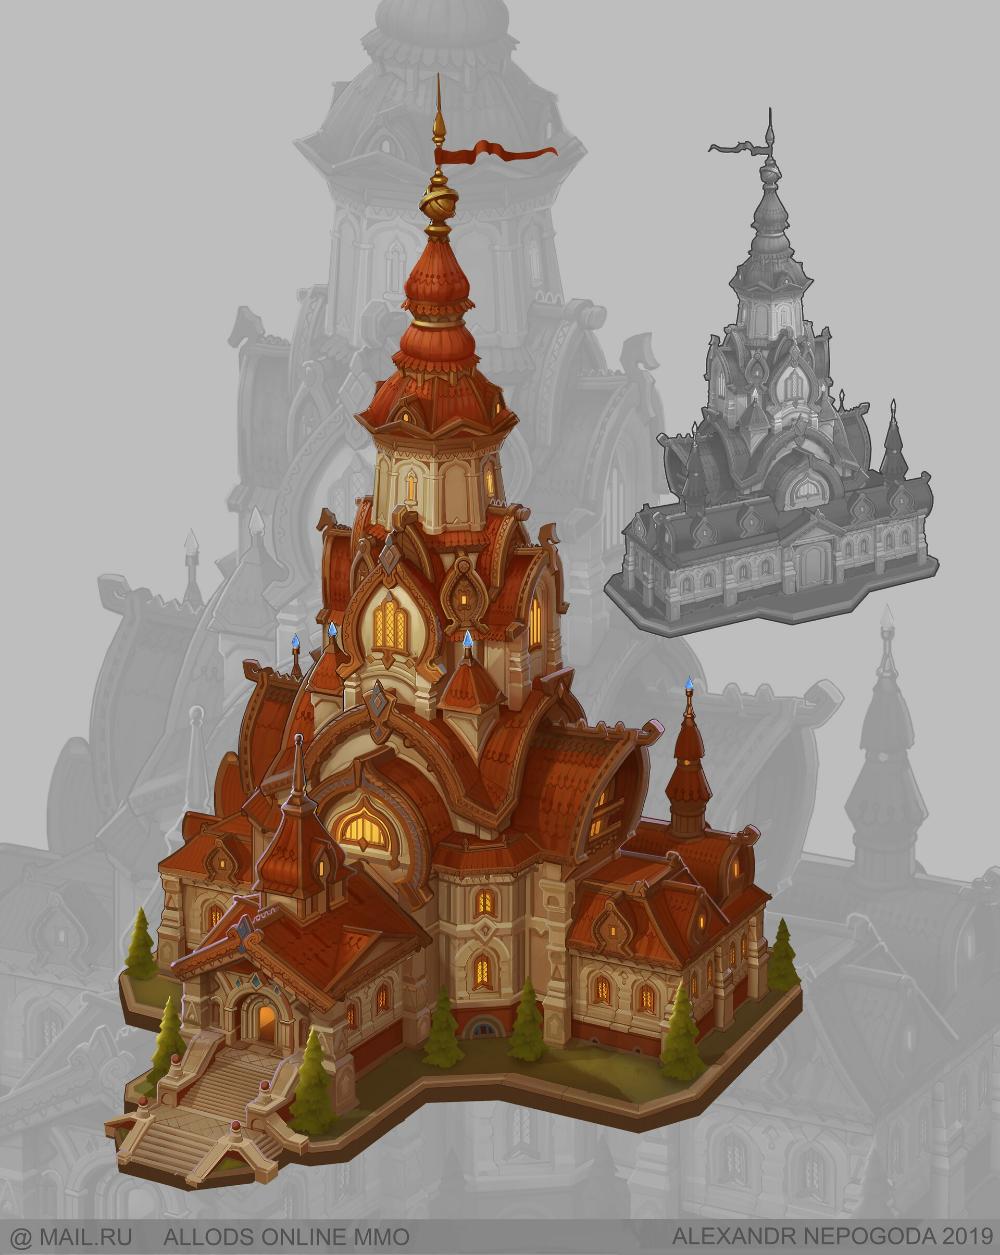 Artstation Allods Online Town Hall Concept Art Alexandr Nepogoda Fantasy Town Concept Art Town Hall